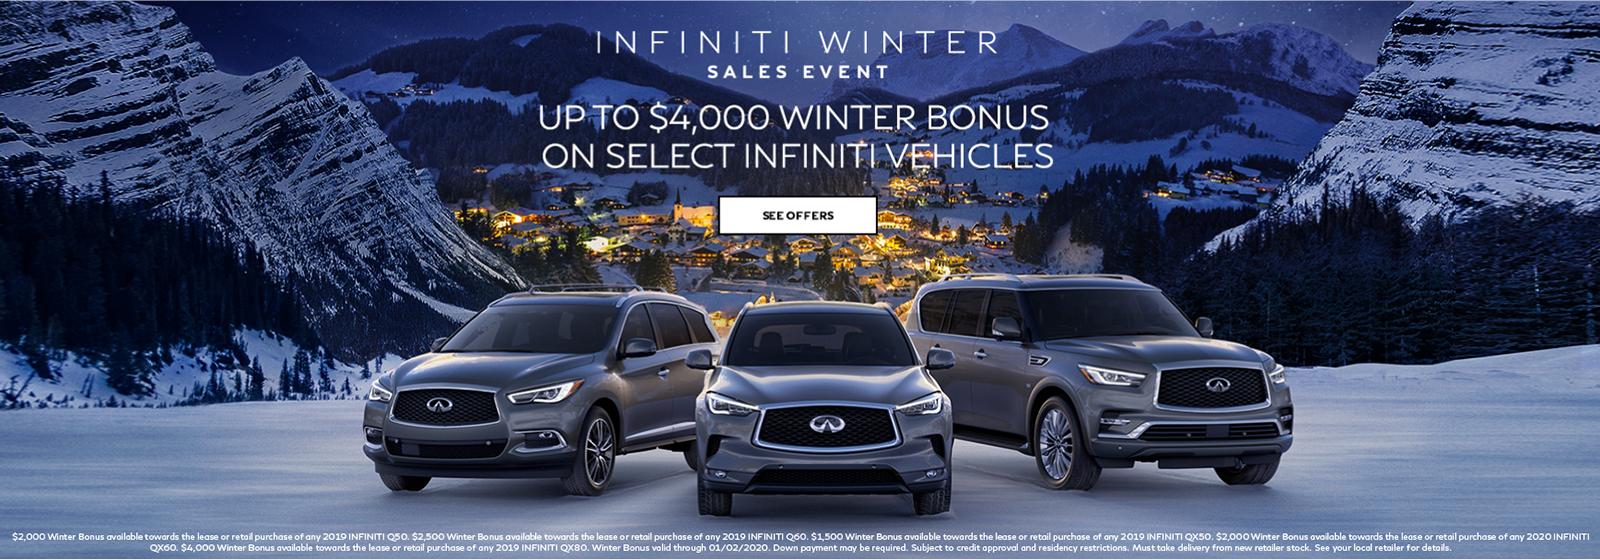 Winter Sales Event